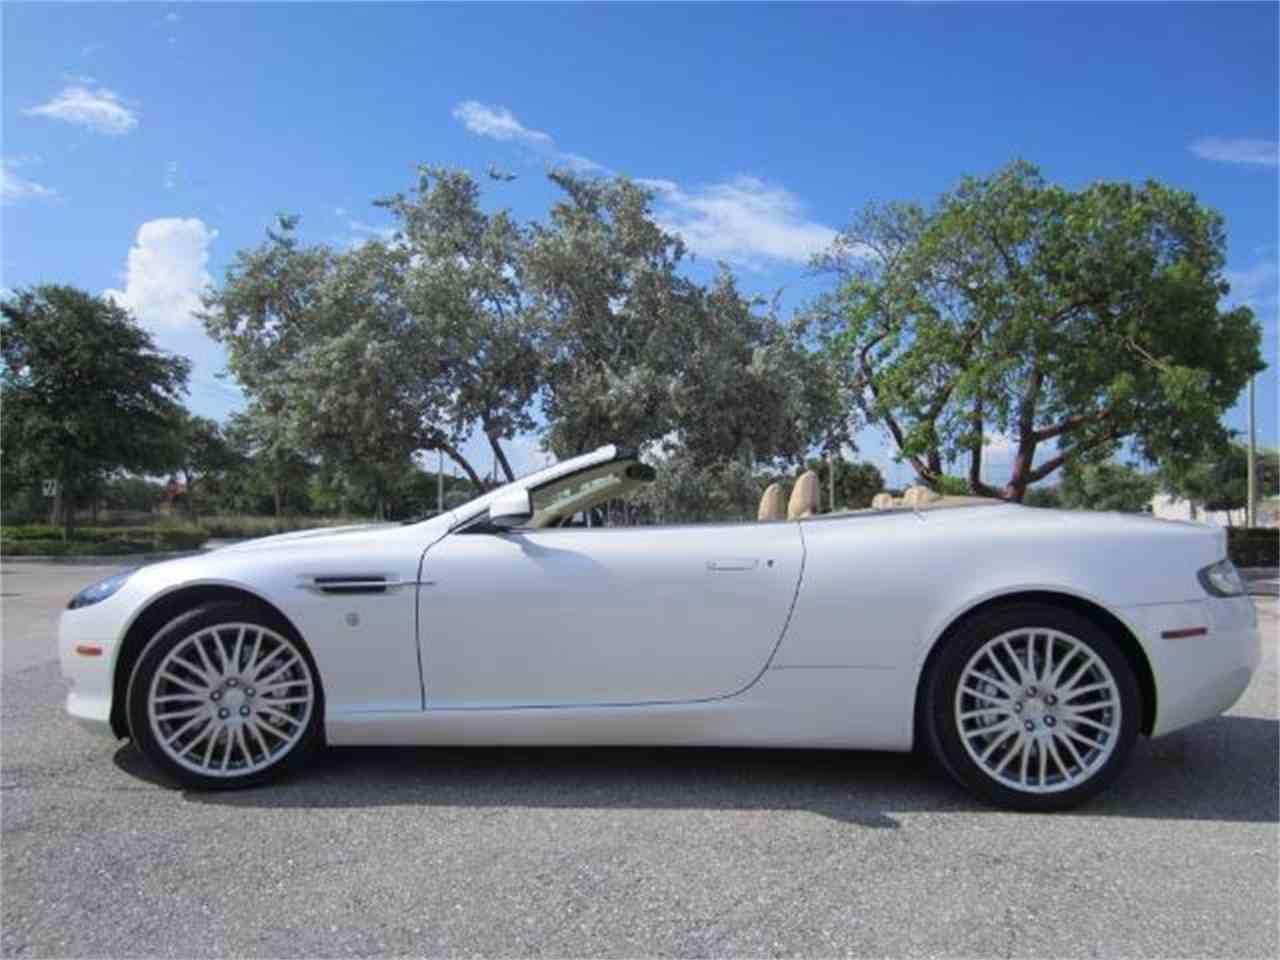 2009 Aston Martin DB9 for Sale - CC-991377